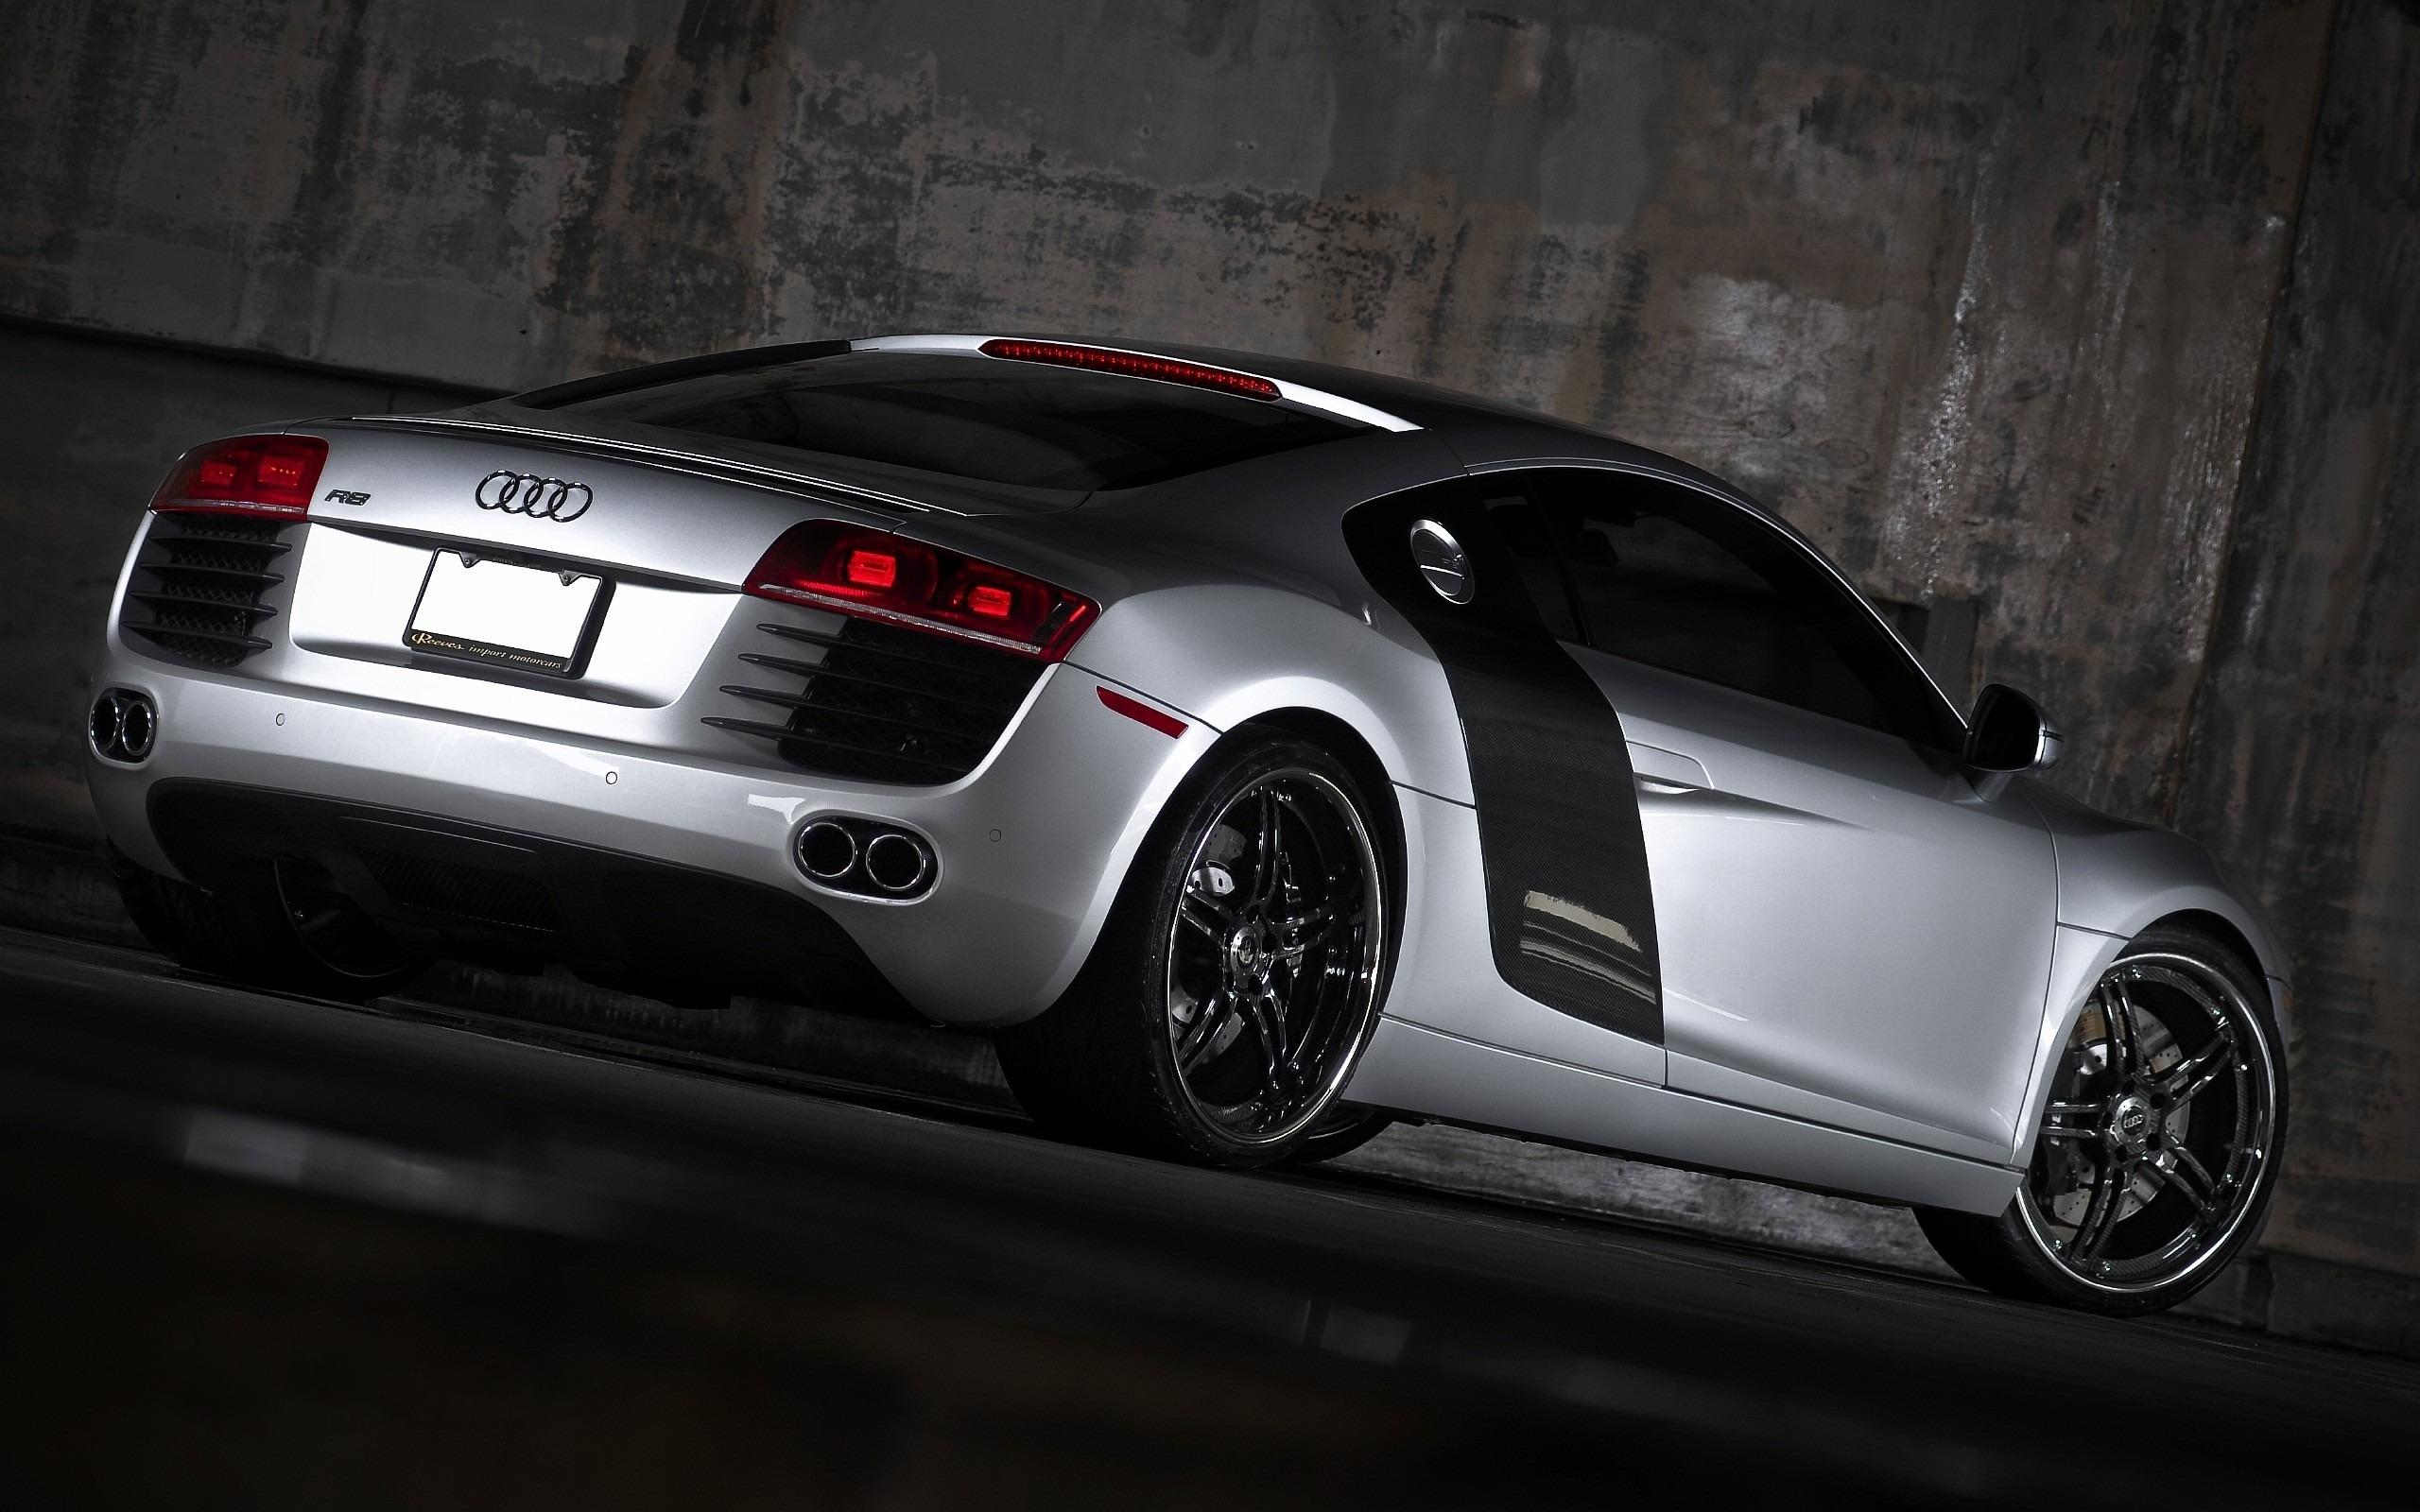 Audi R8 Hd Wallpaper Background Image 2560x1600 Id 401392